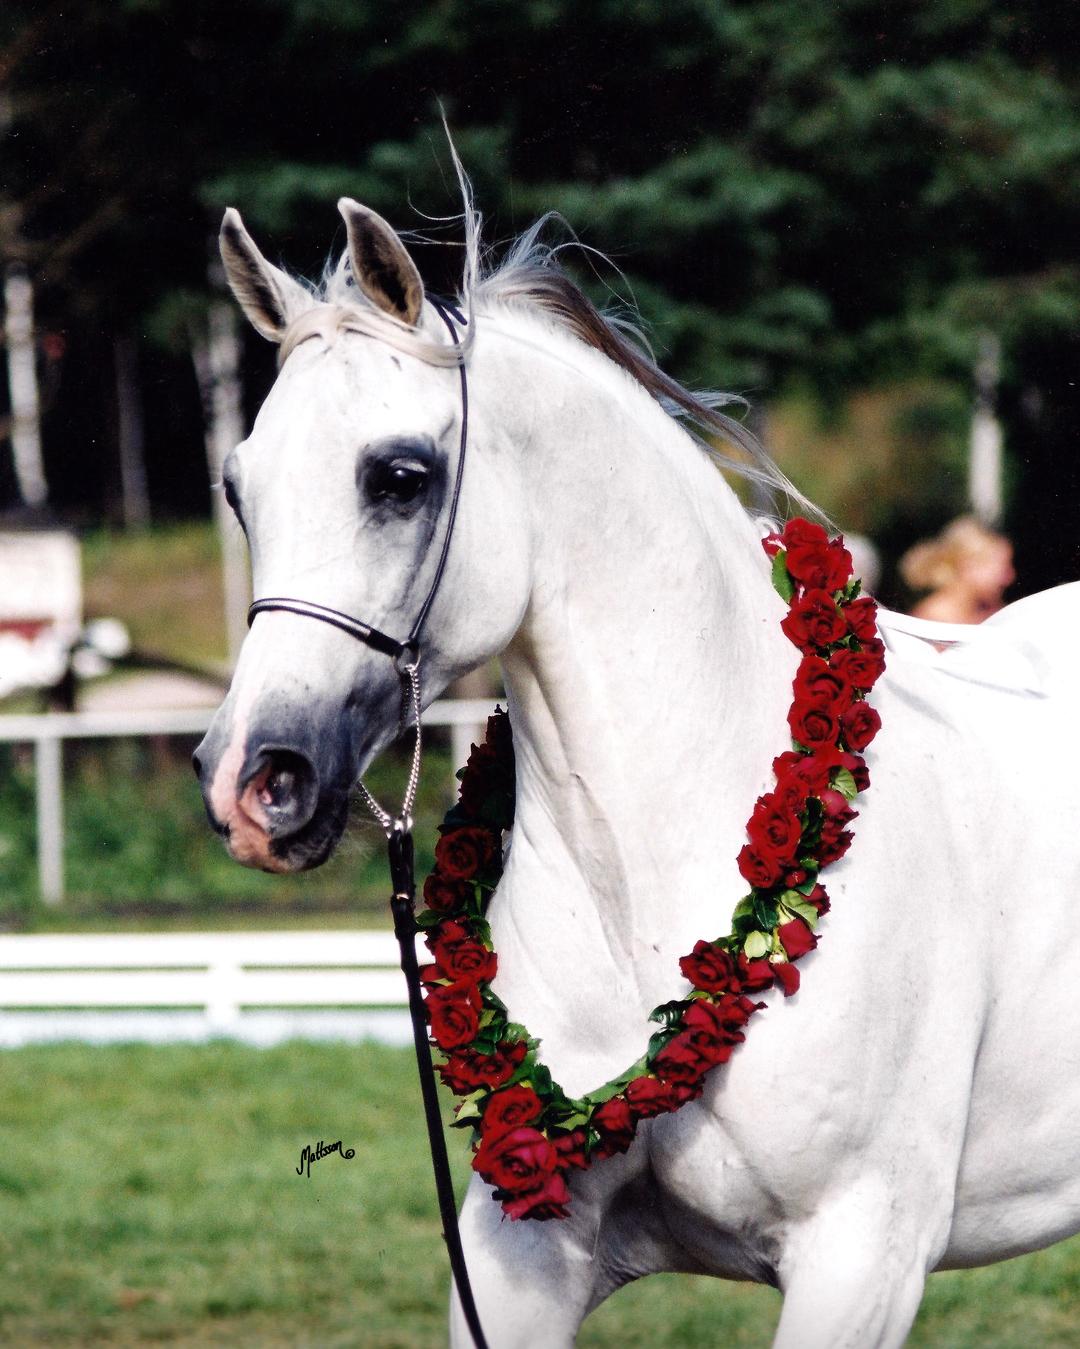 Prognoza (Etogram- Palestra) 3 times Swedish National Champion Mare